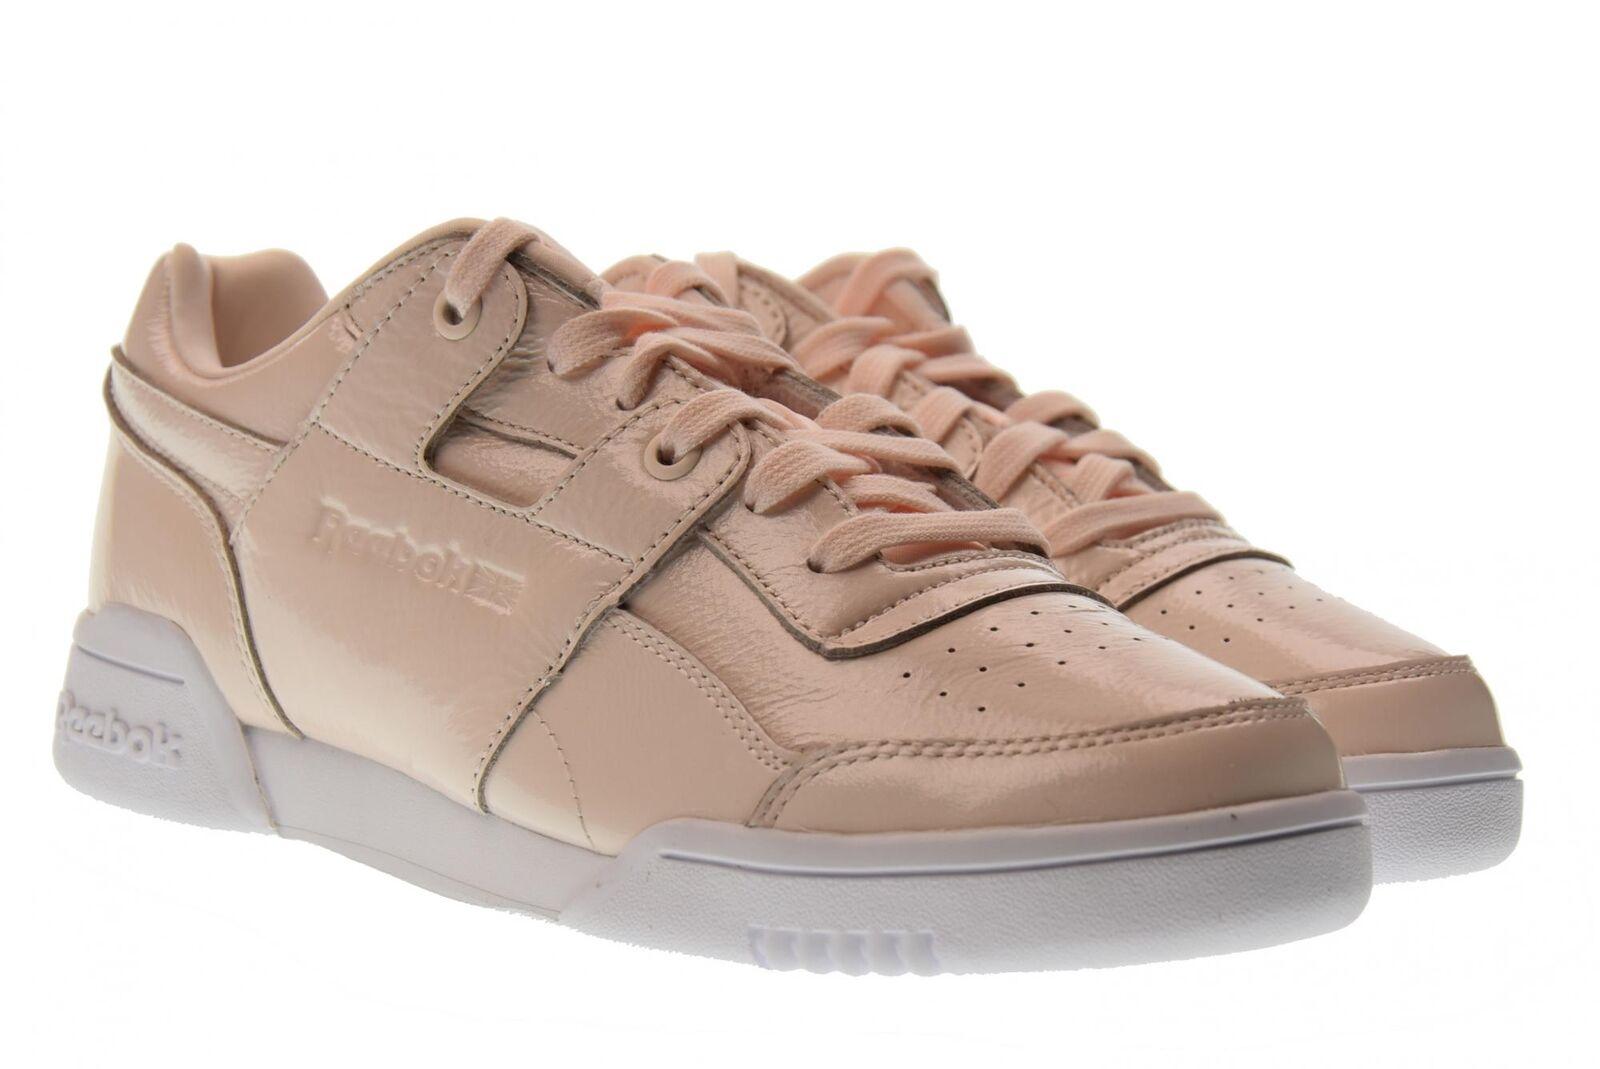 Reebok Frauen niedrige Turnschuhe Schuhe CM8951 W / O-PLUS irisierenden P18g